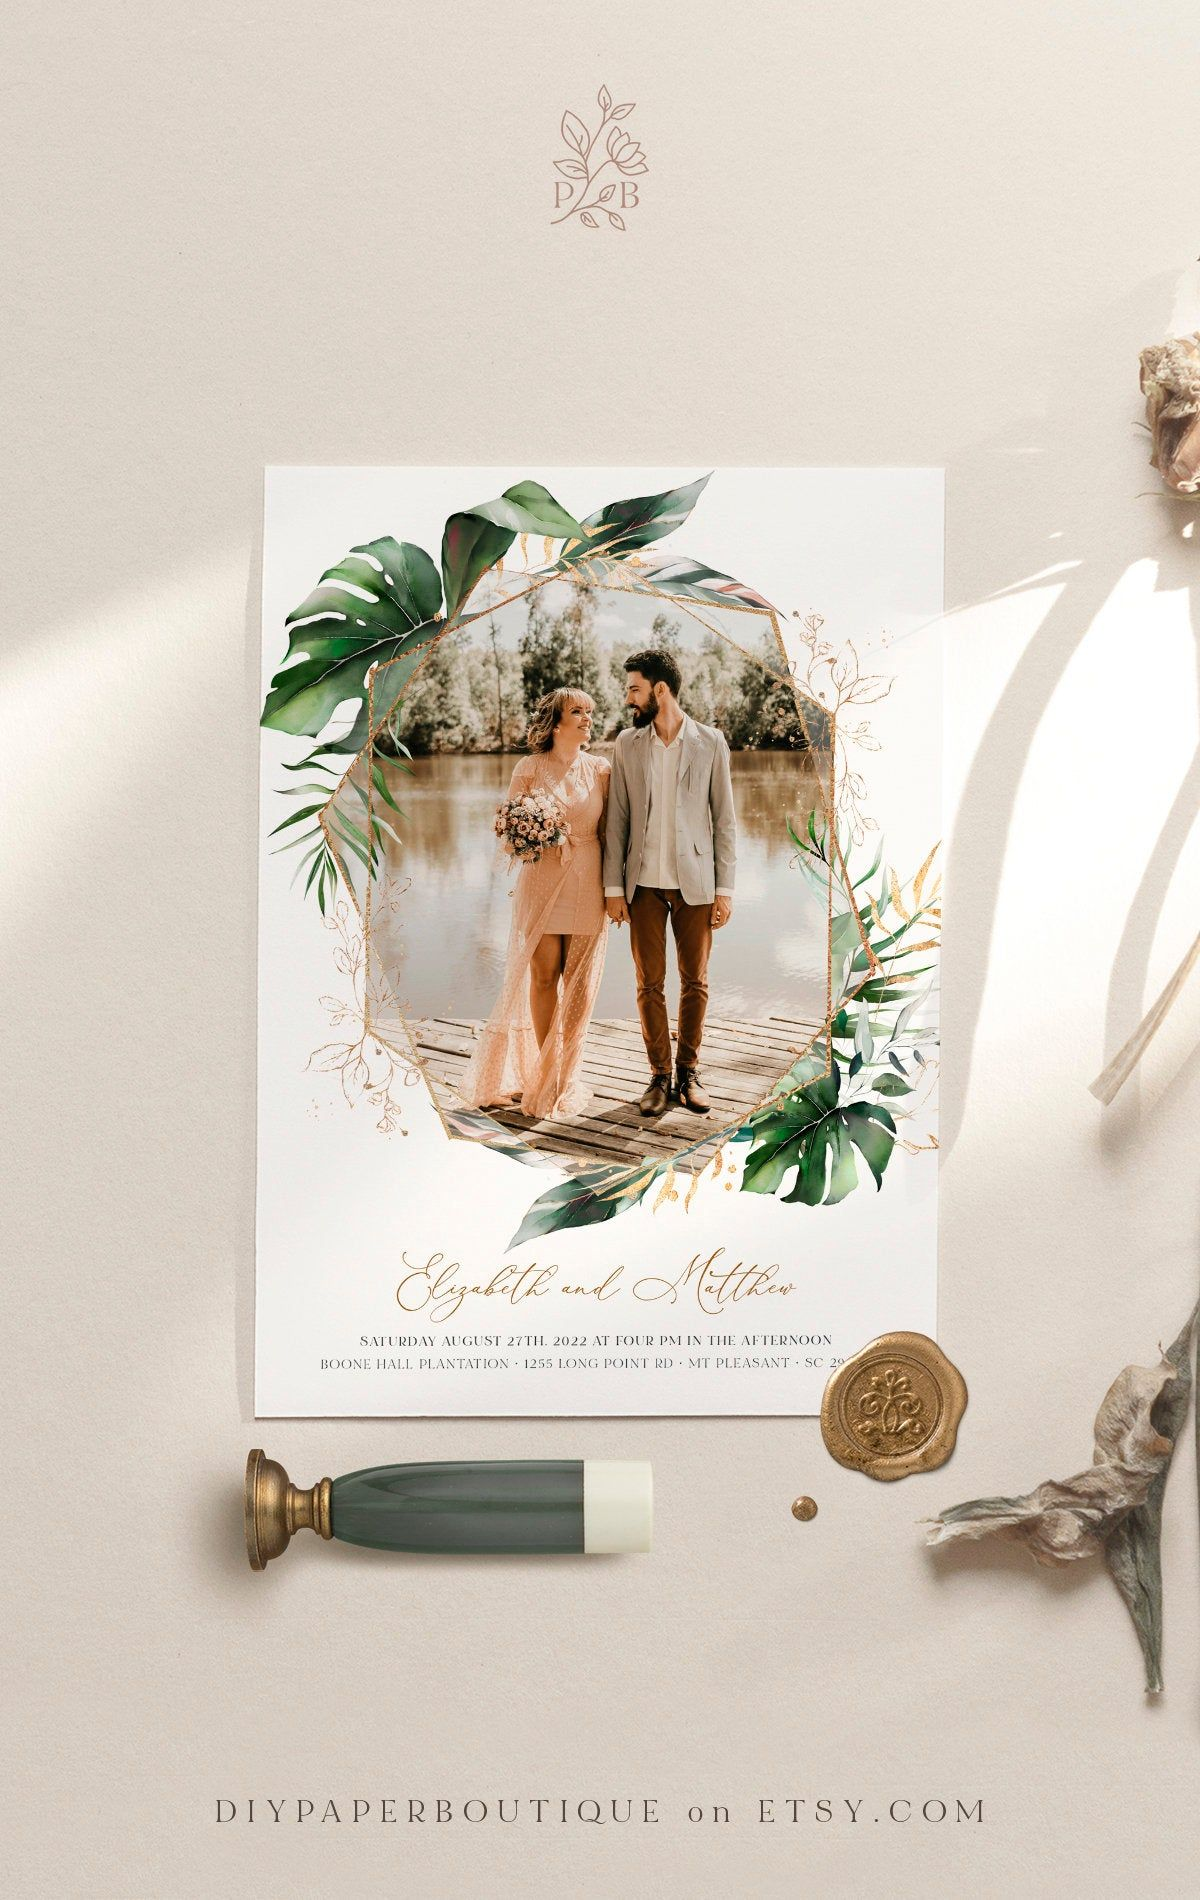 Botanical Editable Invites Greenery Invitations Tropical Picture Wedding Invite Photo Wedding Invitation Template PAIGE Picture Invite